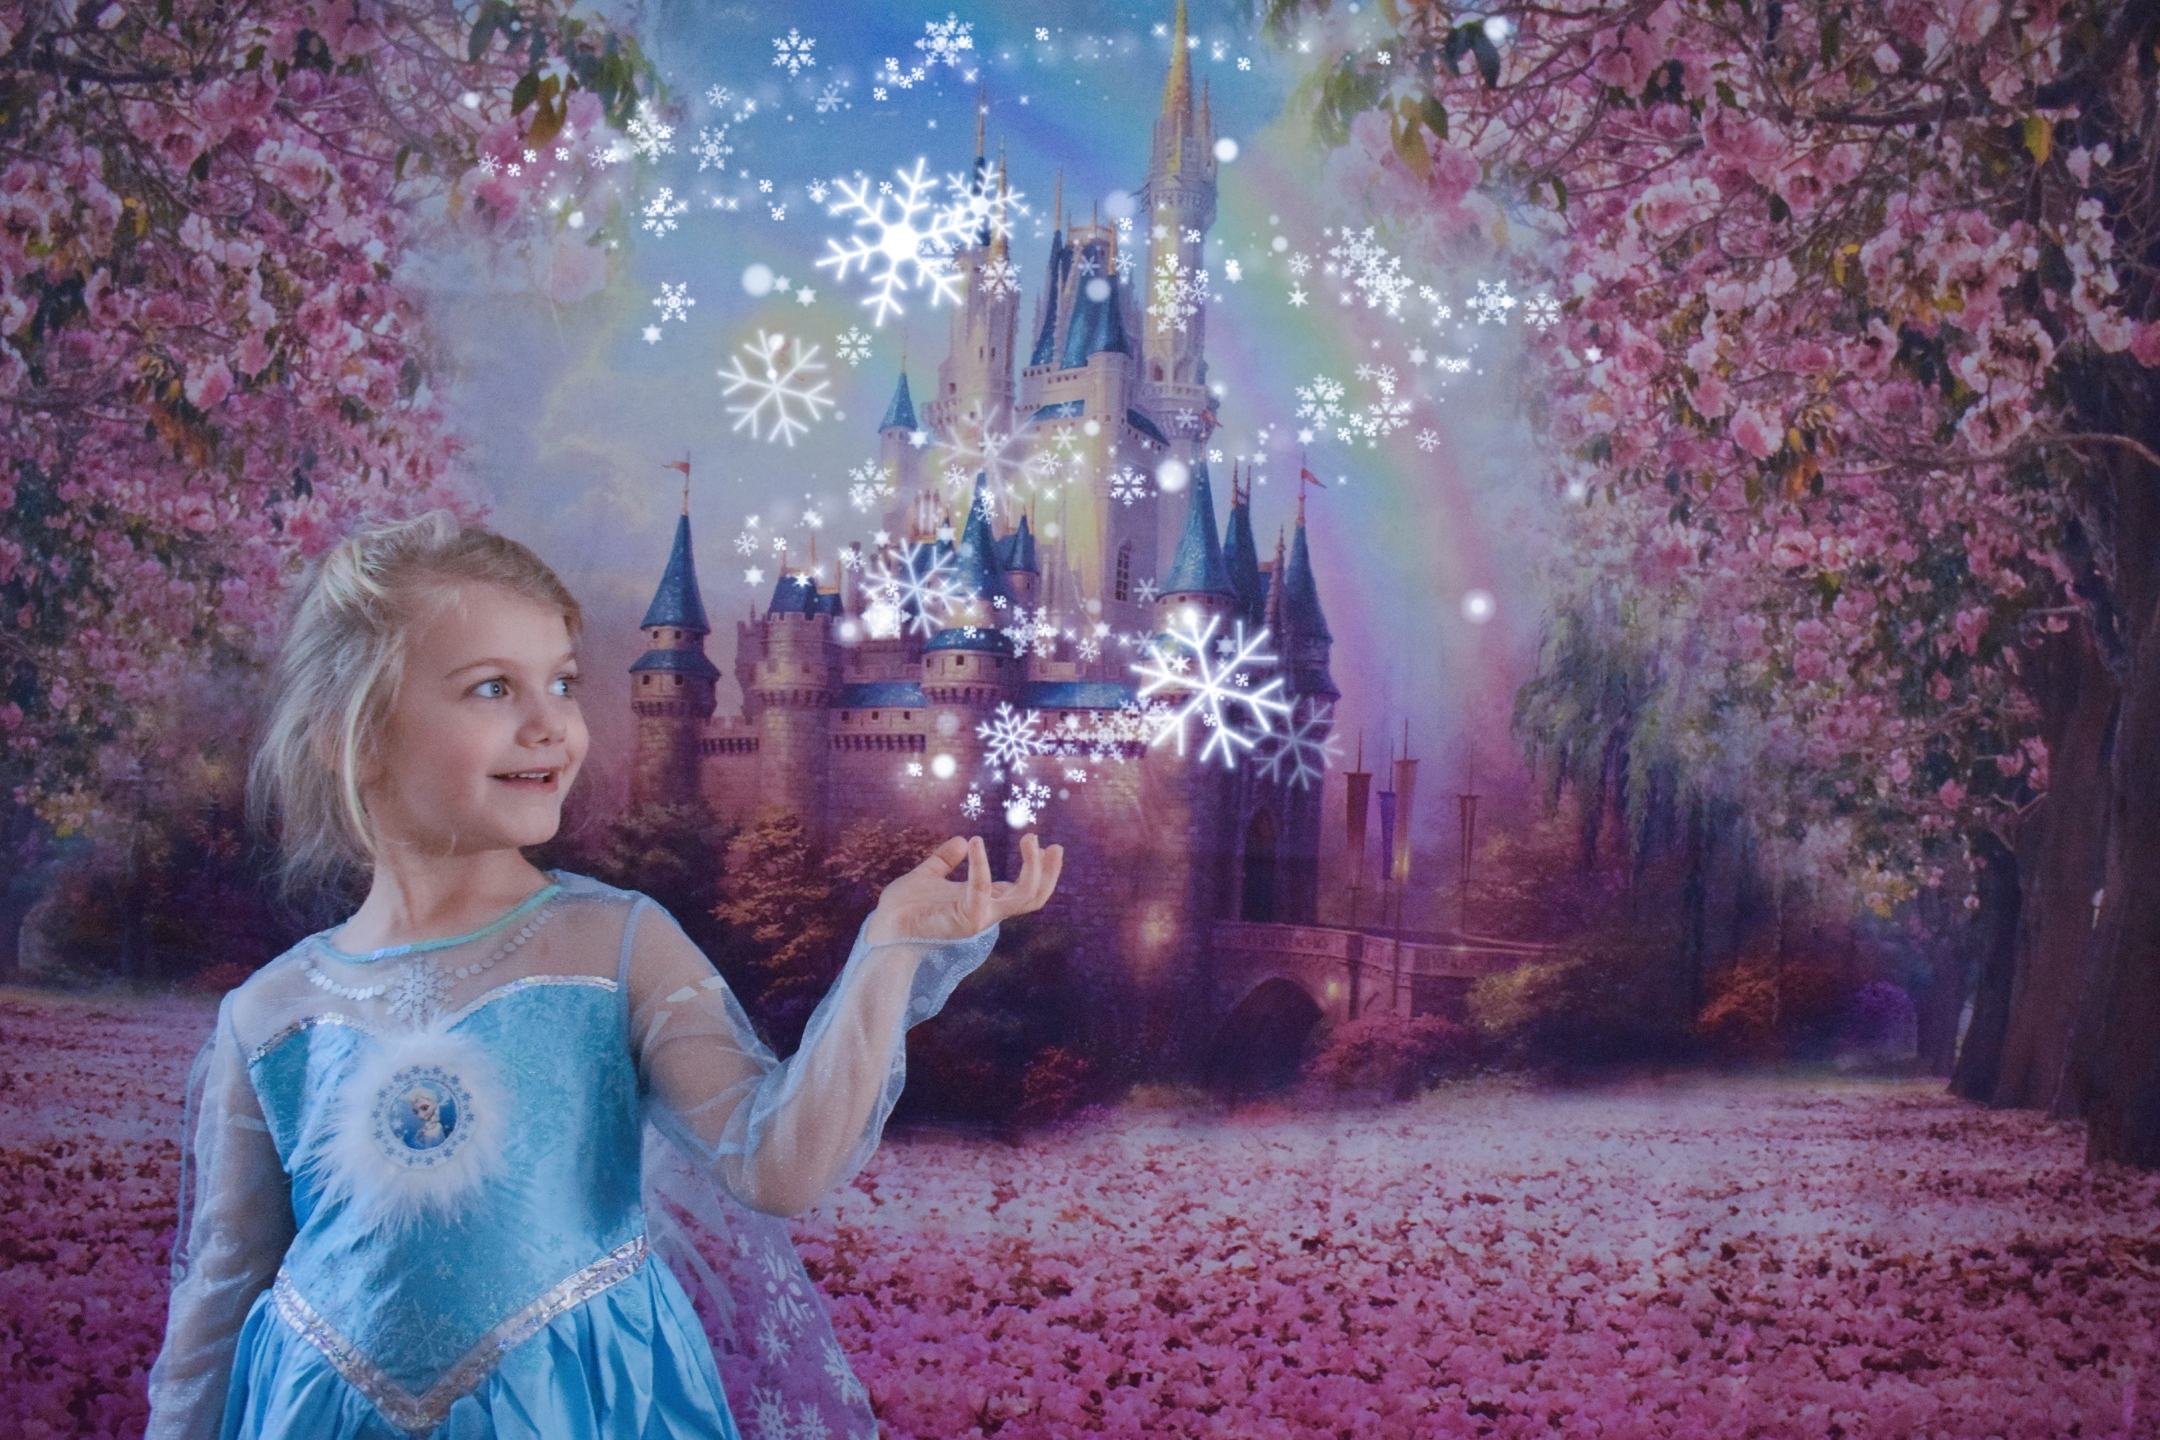 Dressing up as Queen Elsa of Arendelle, magical Disney princess